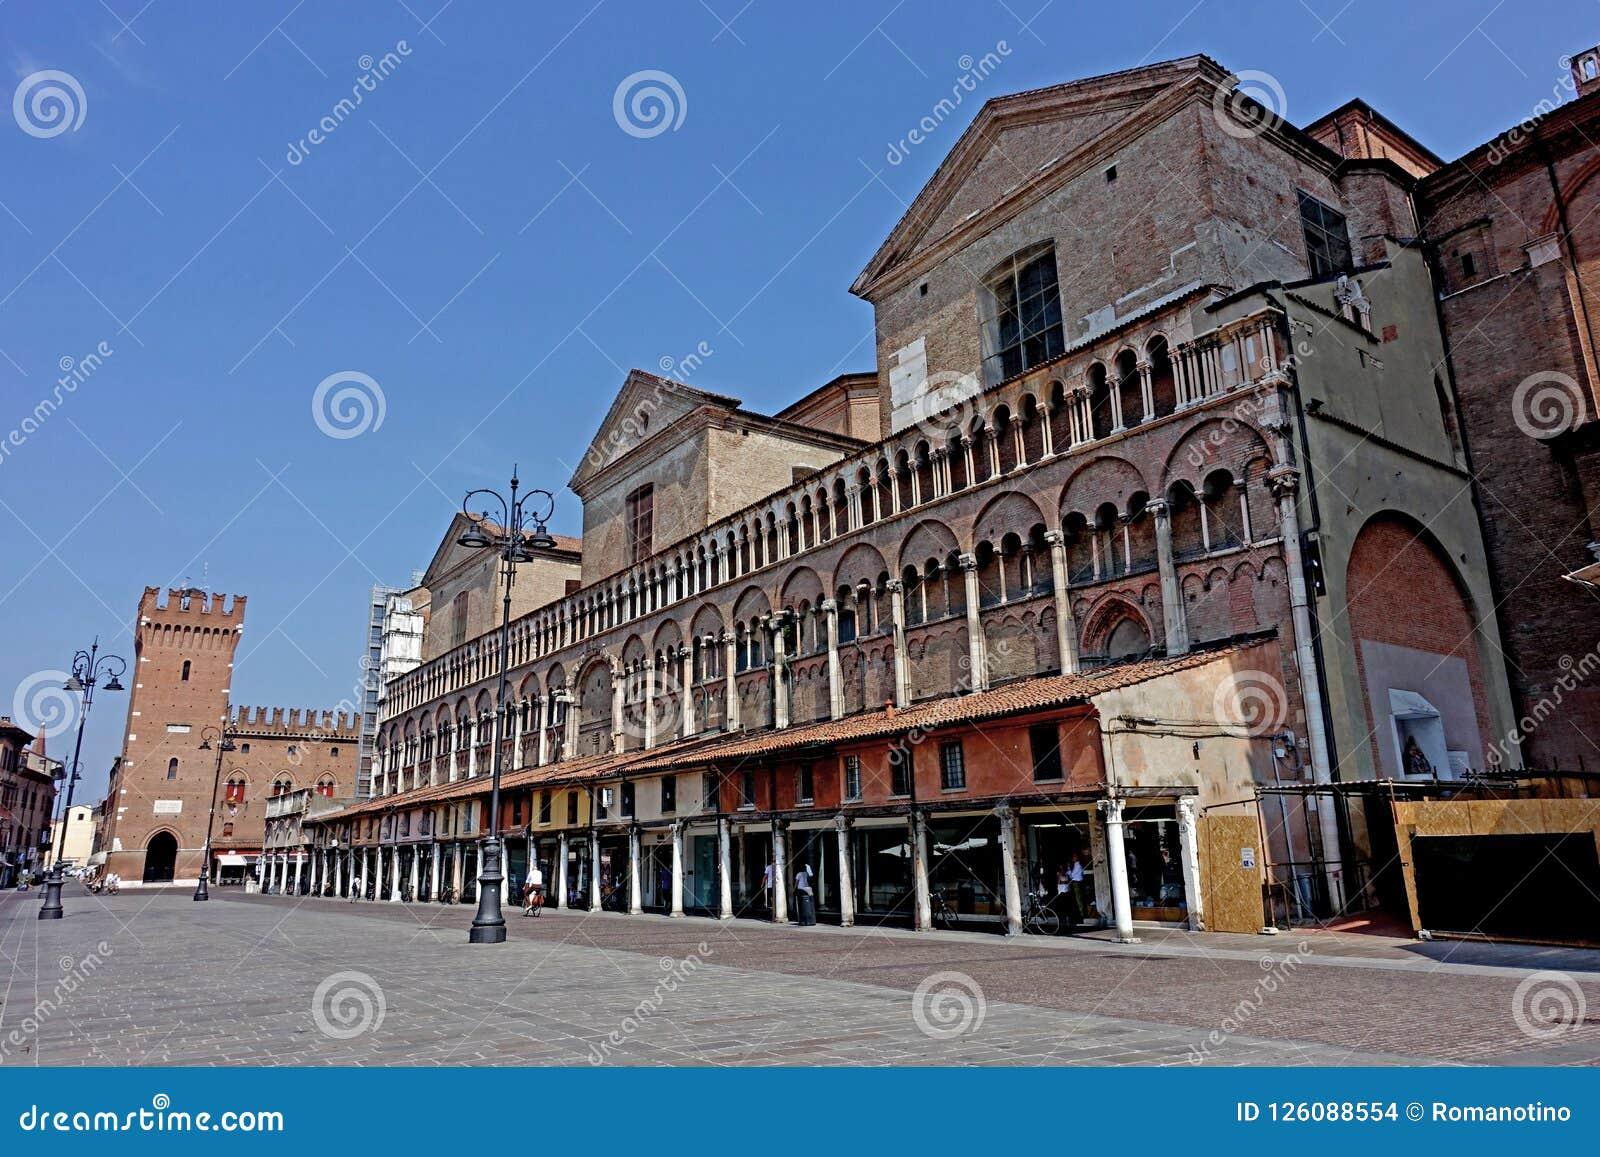 Cuadrado de Trento e Trieste de la plaza de Ferrara